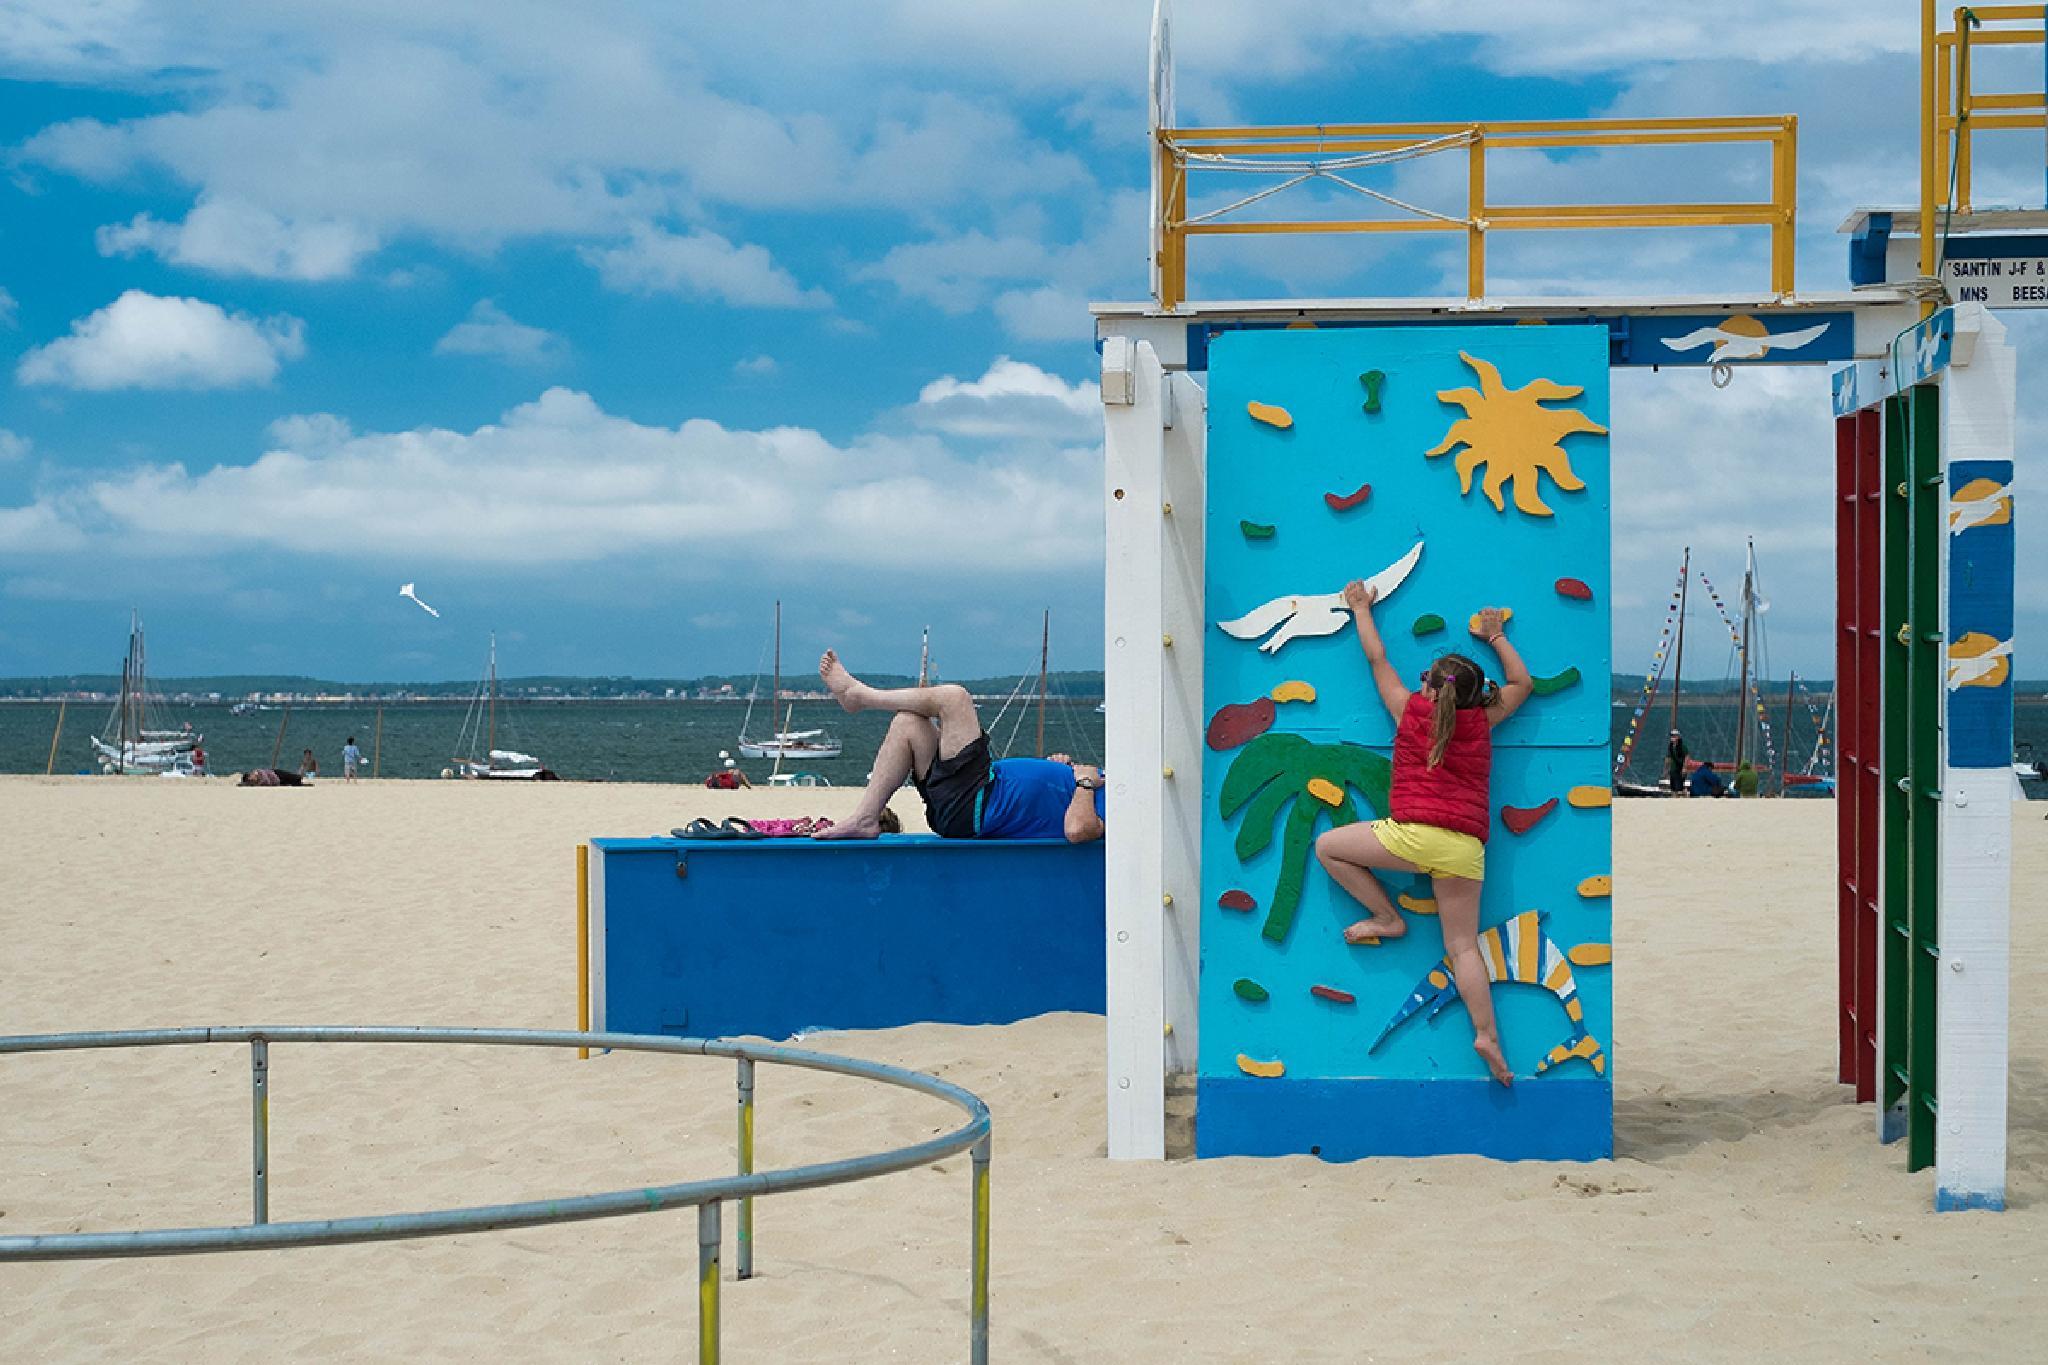 Mickey beach playground by Arnaud BROSSARD